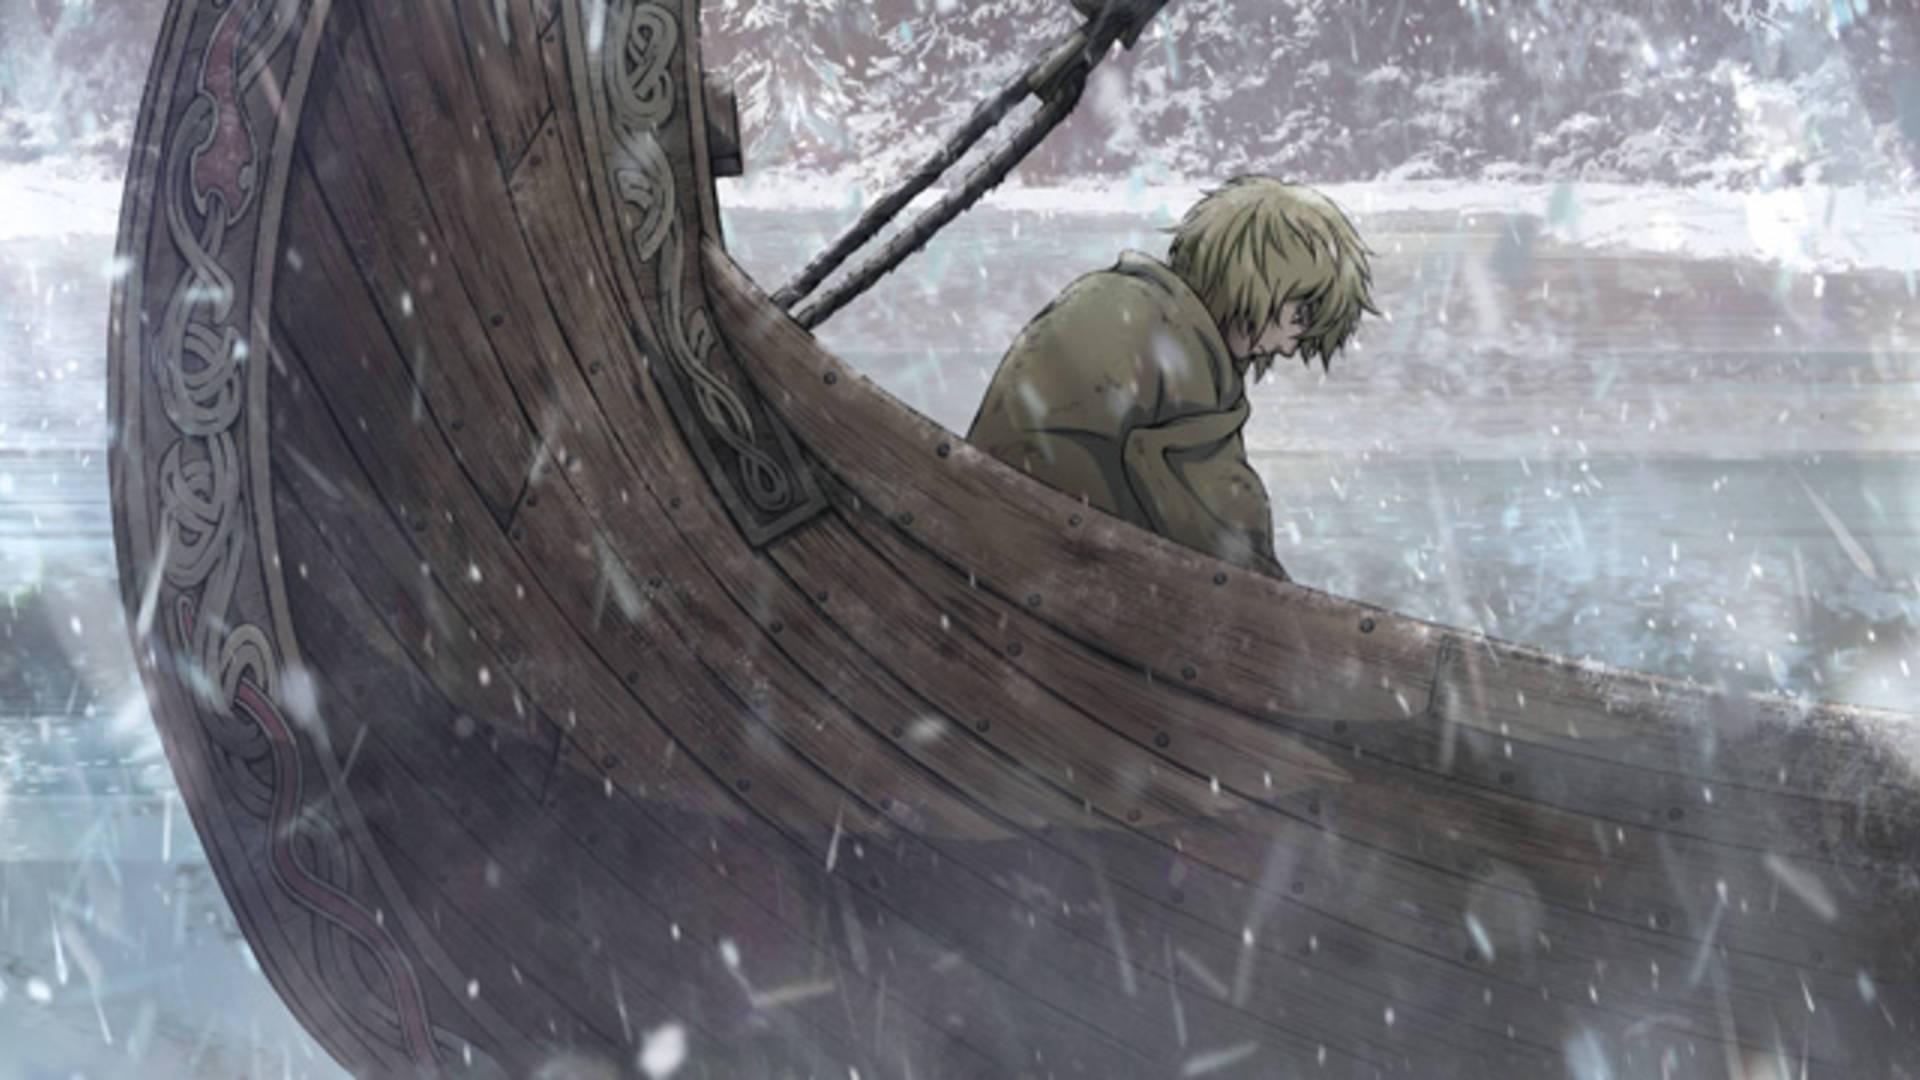 Vinland Saga anime update